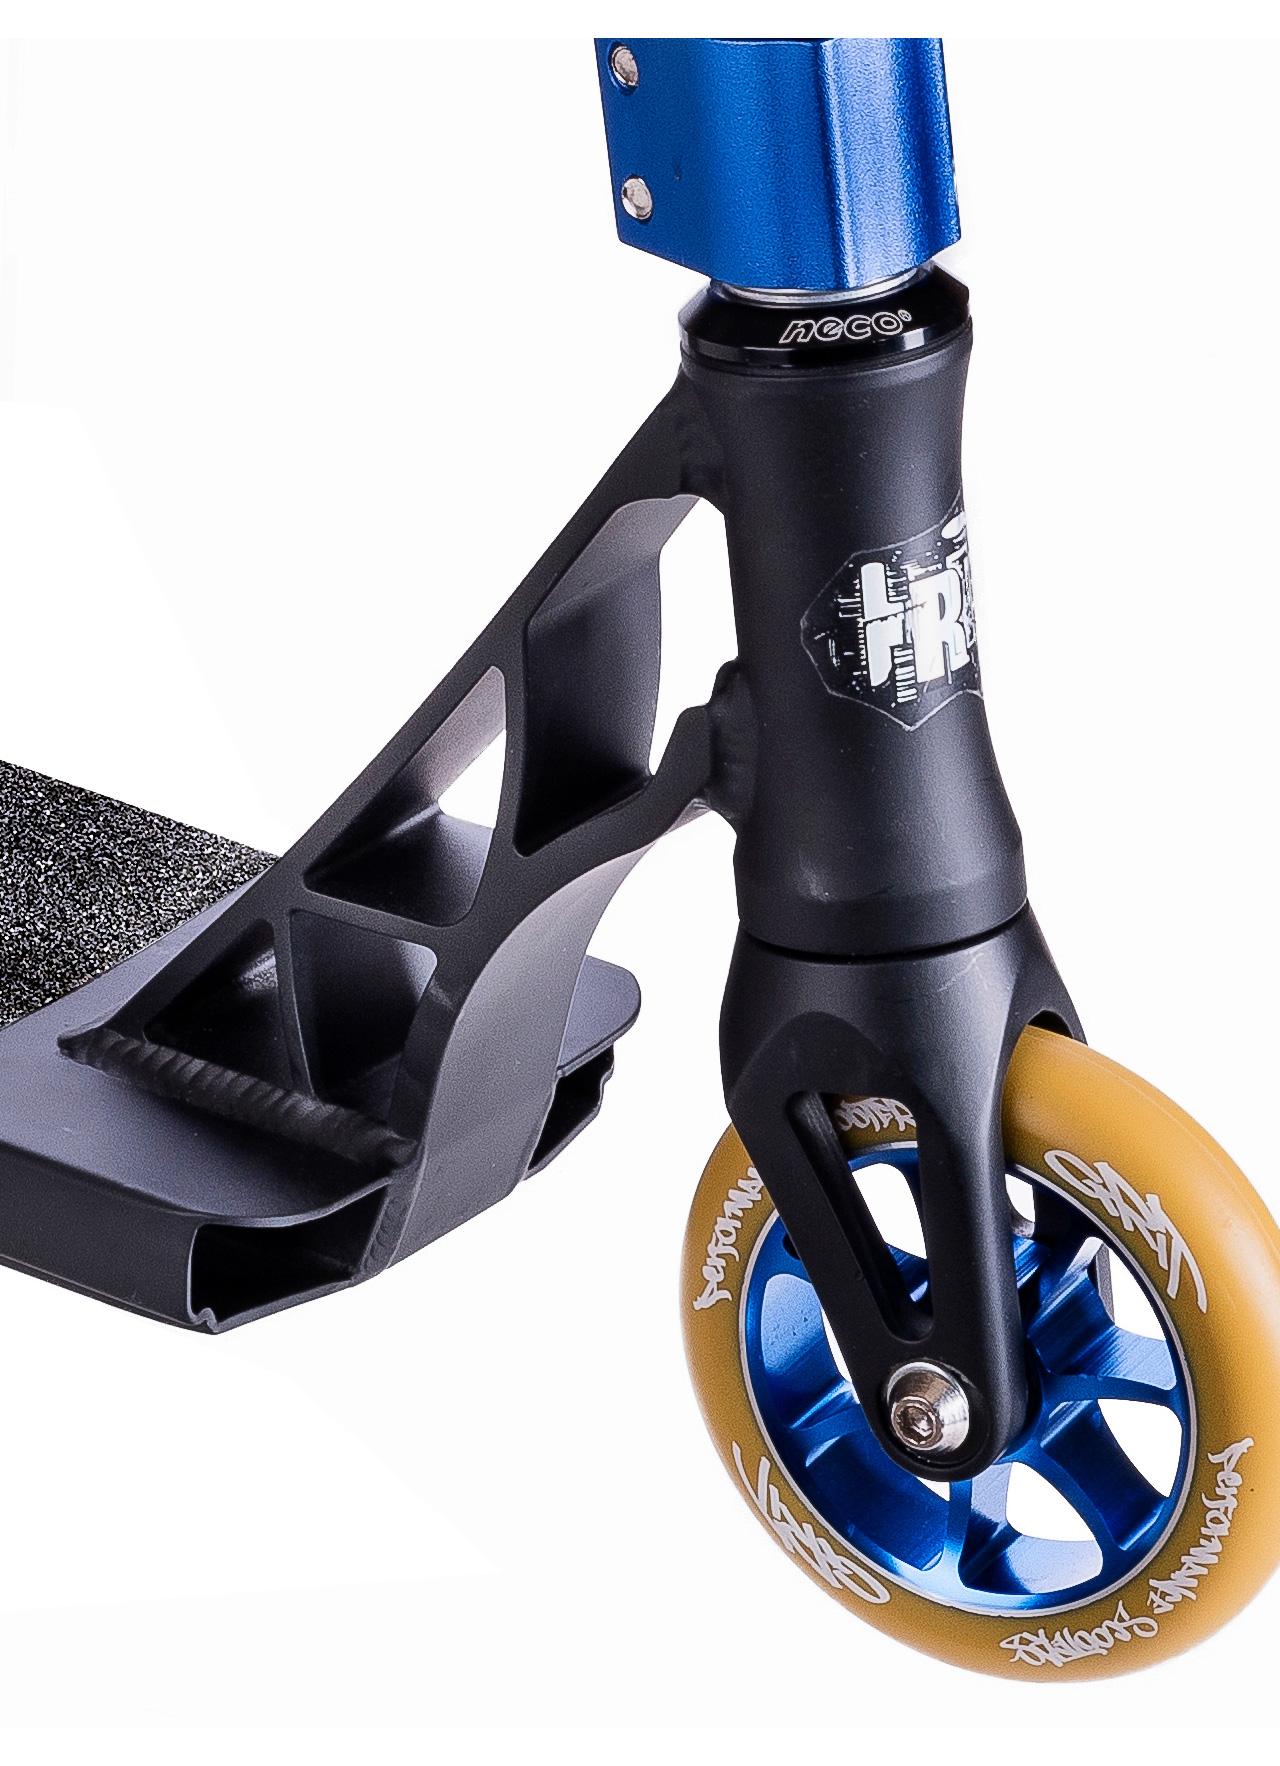 Ben Thomas signature scooter